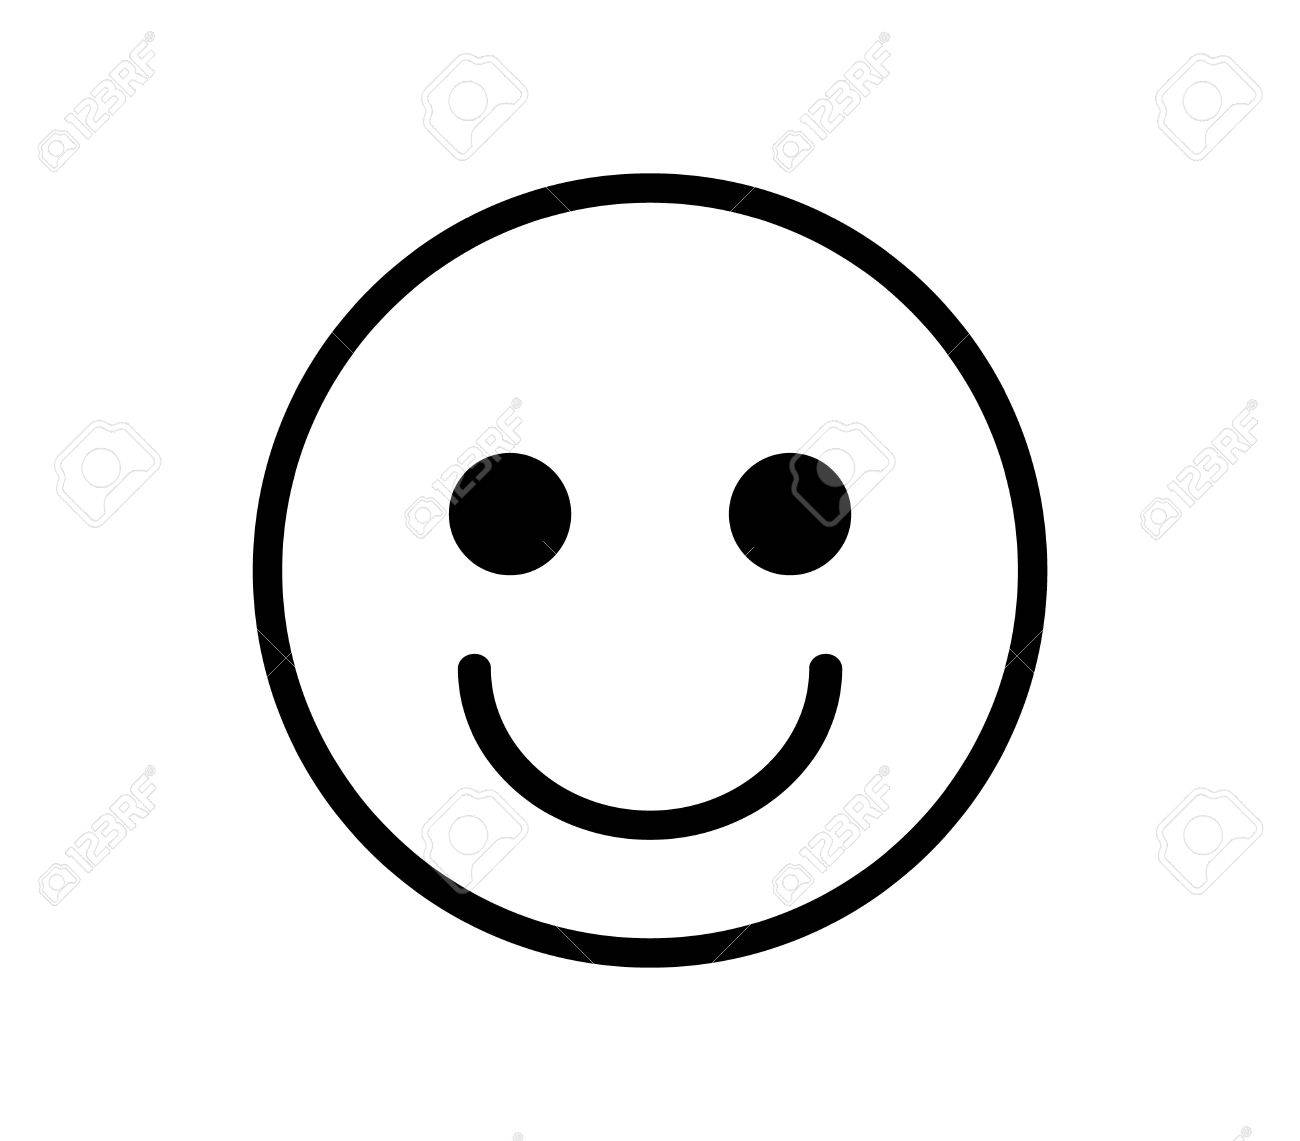 icon smail. smiles icon vector, flat design best vector icon Stock Vector - 82413339